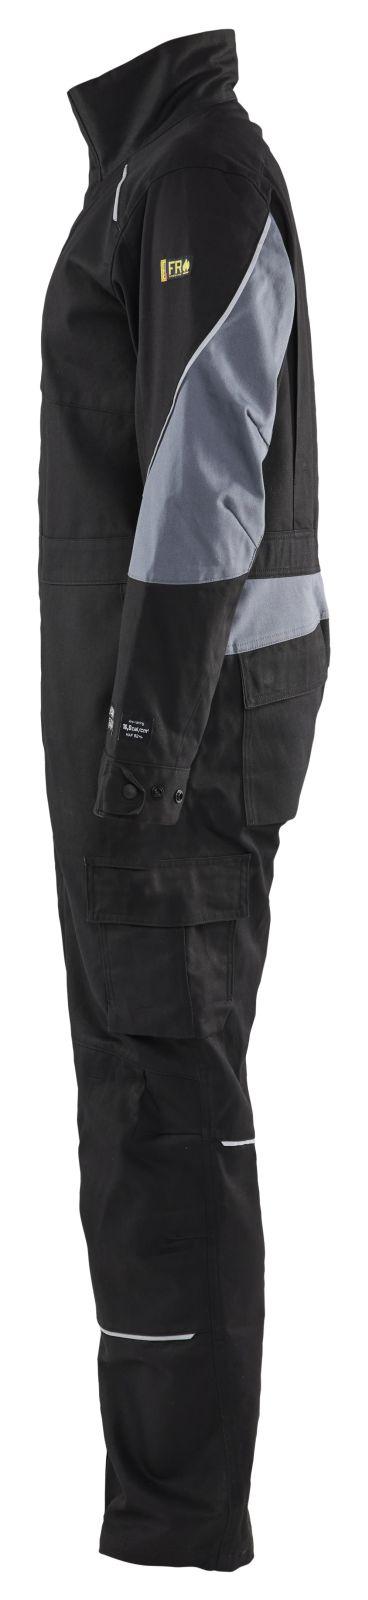 Blaklader Overalls 60611516 Vlamvertragend zwart-grijs(9994)